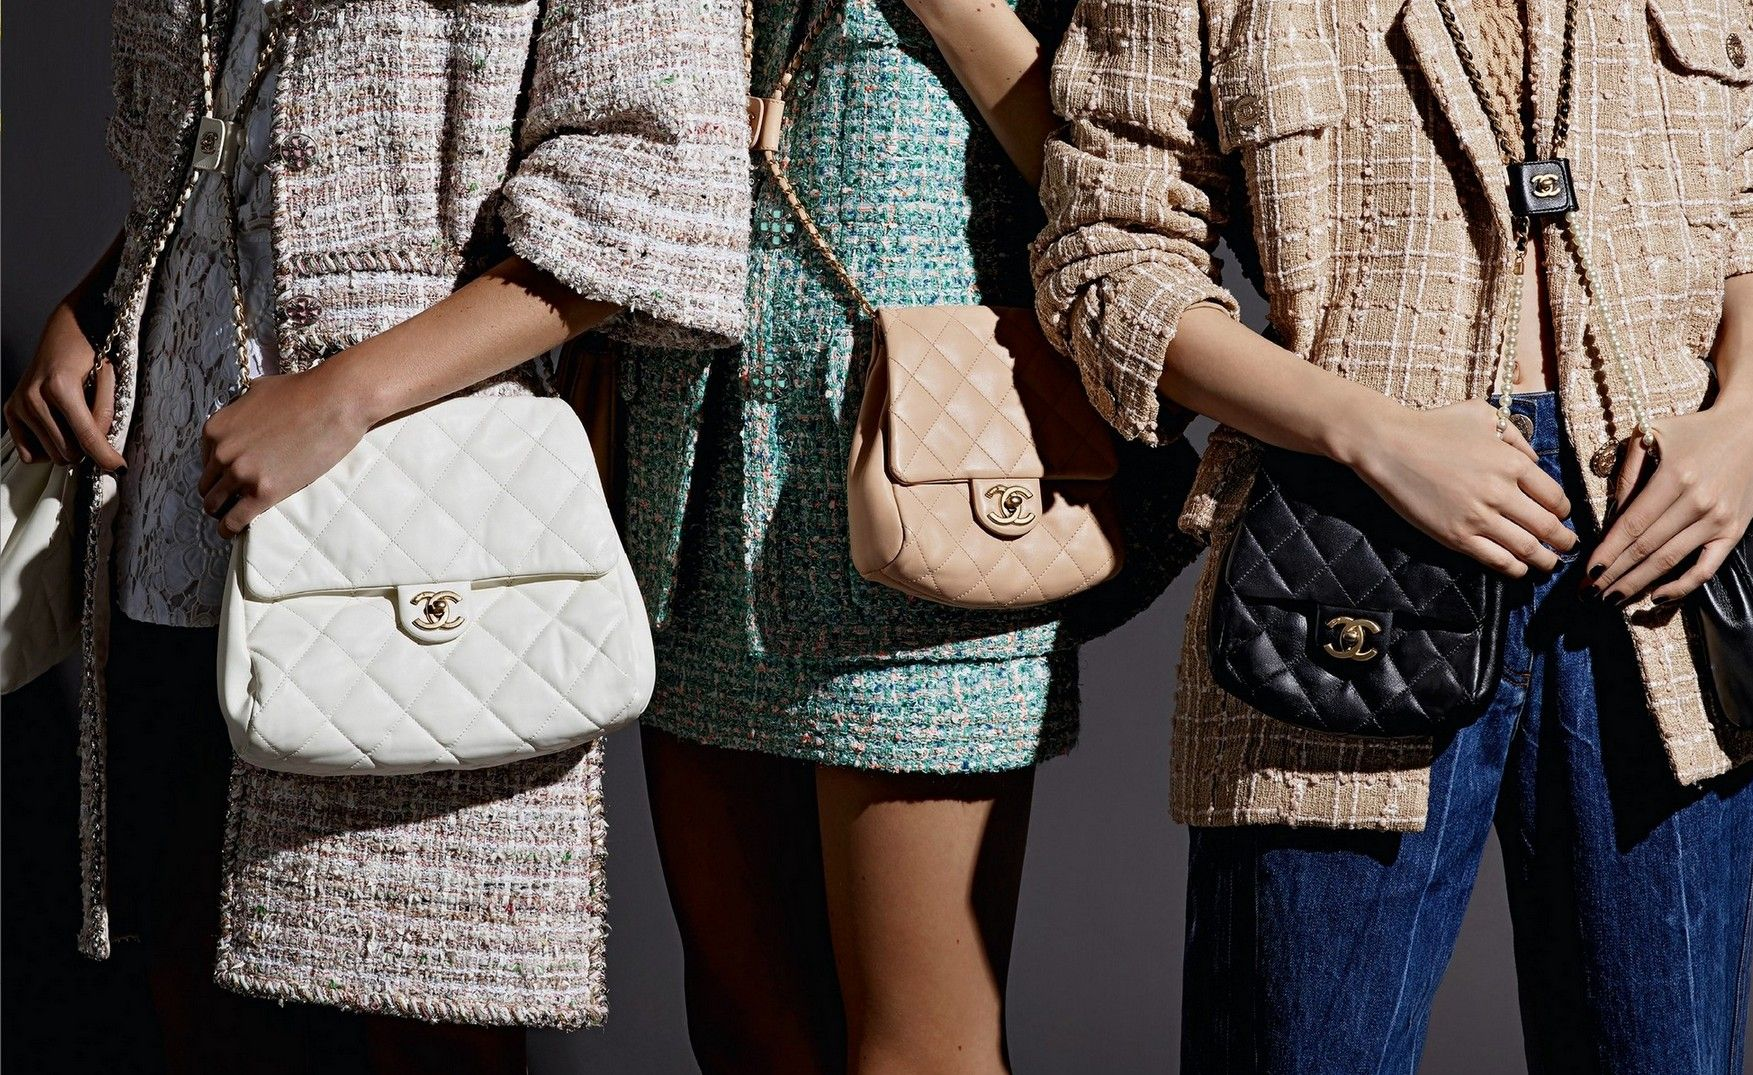 CHANEL, Chanel, Chanel春夏包款, Karl Lagerfeld, 包包, 包款推薦, 卡爾拉格斐, 老佛爺, 錬帶雙包, 香奈兒